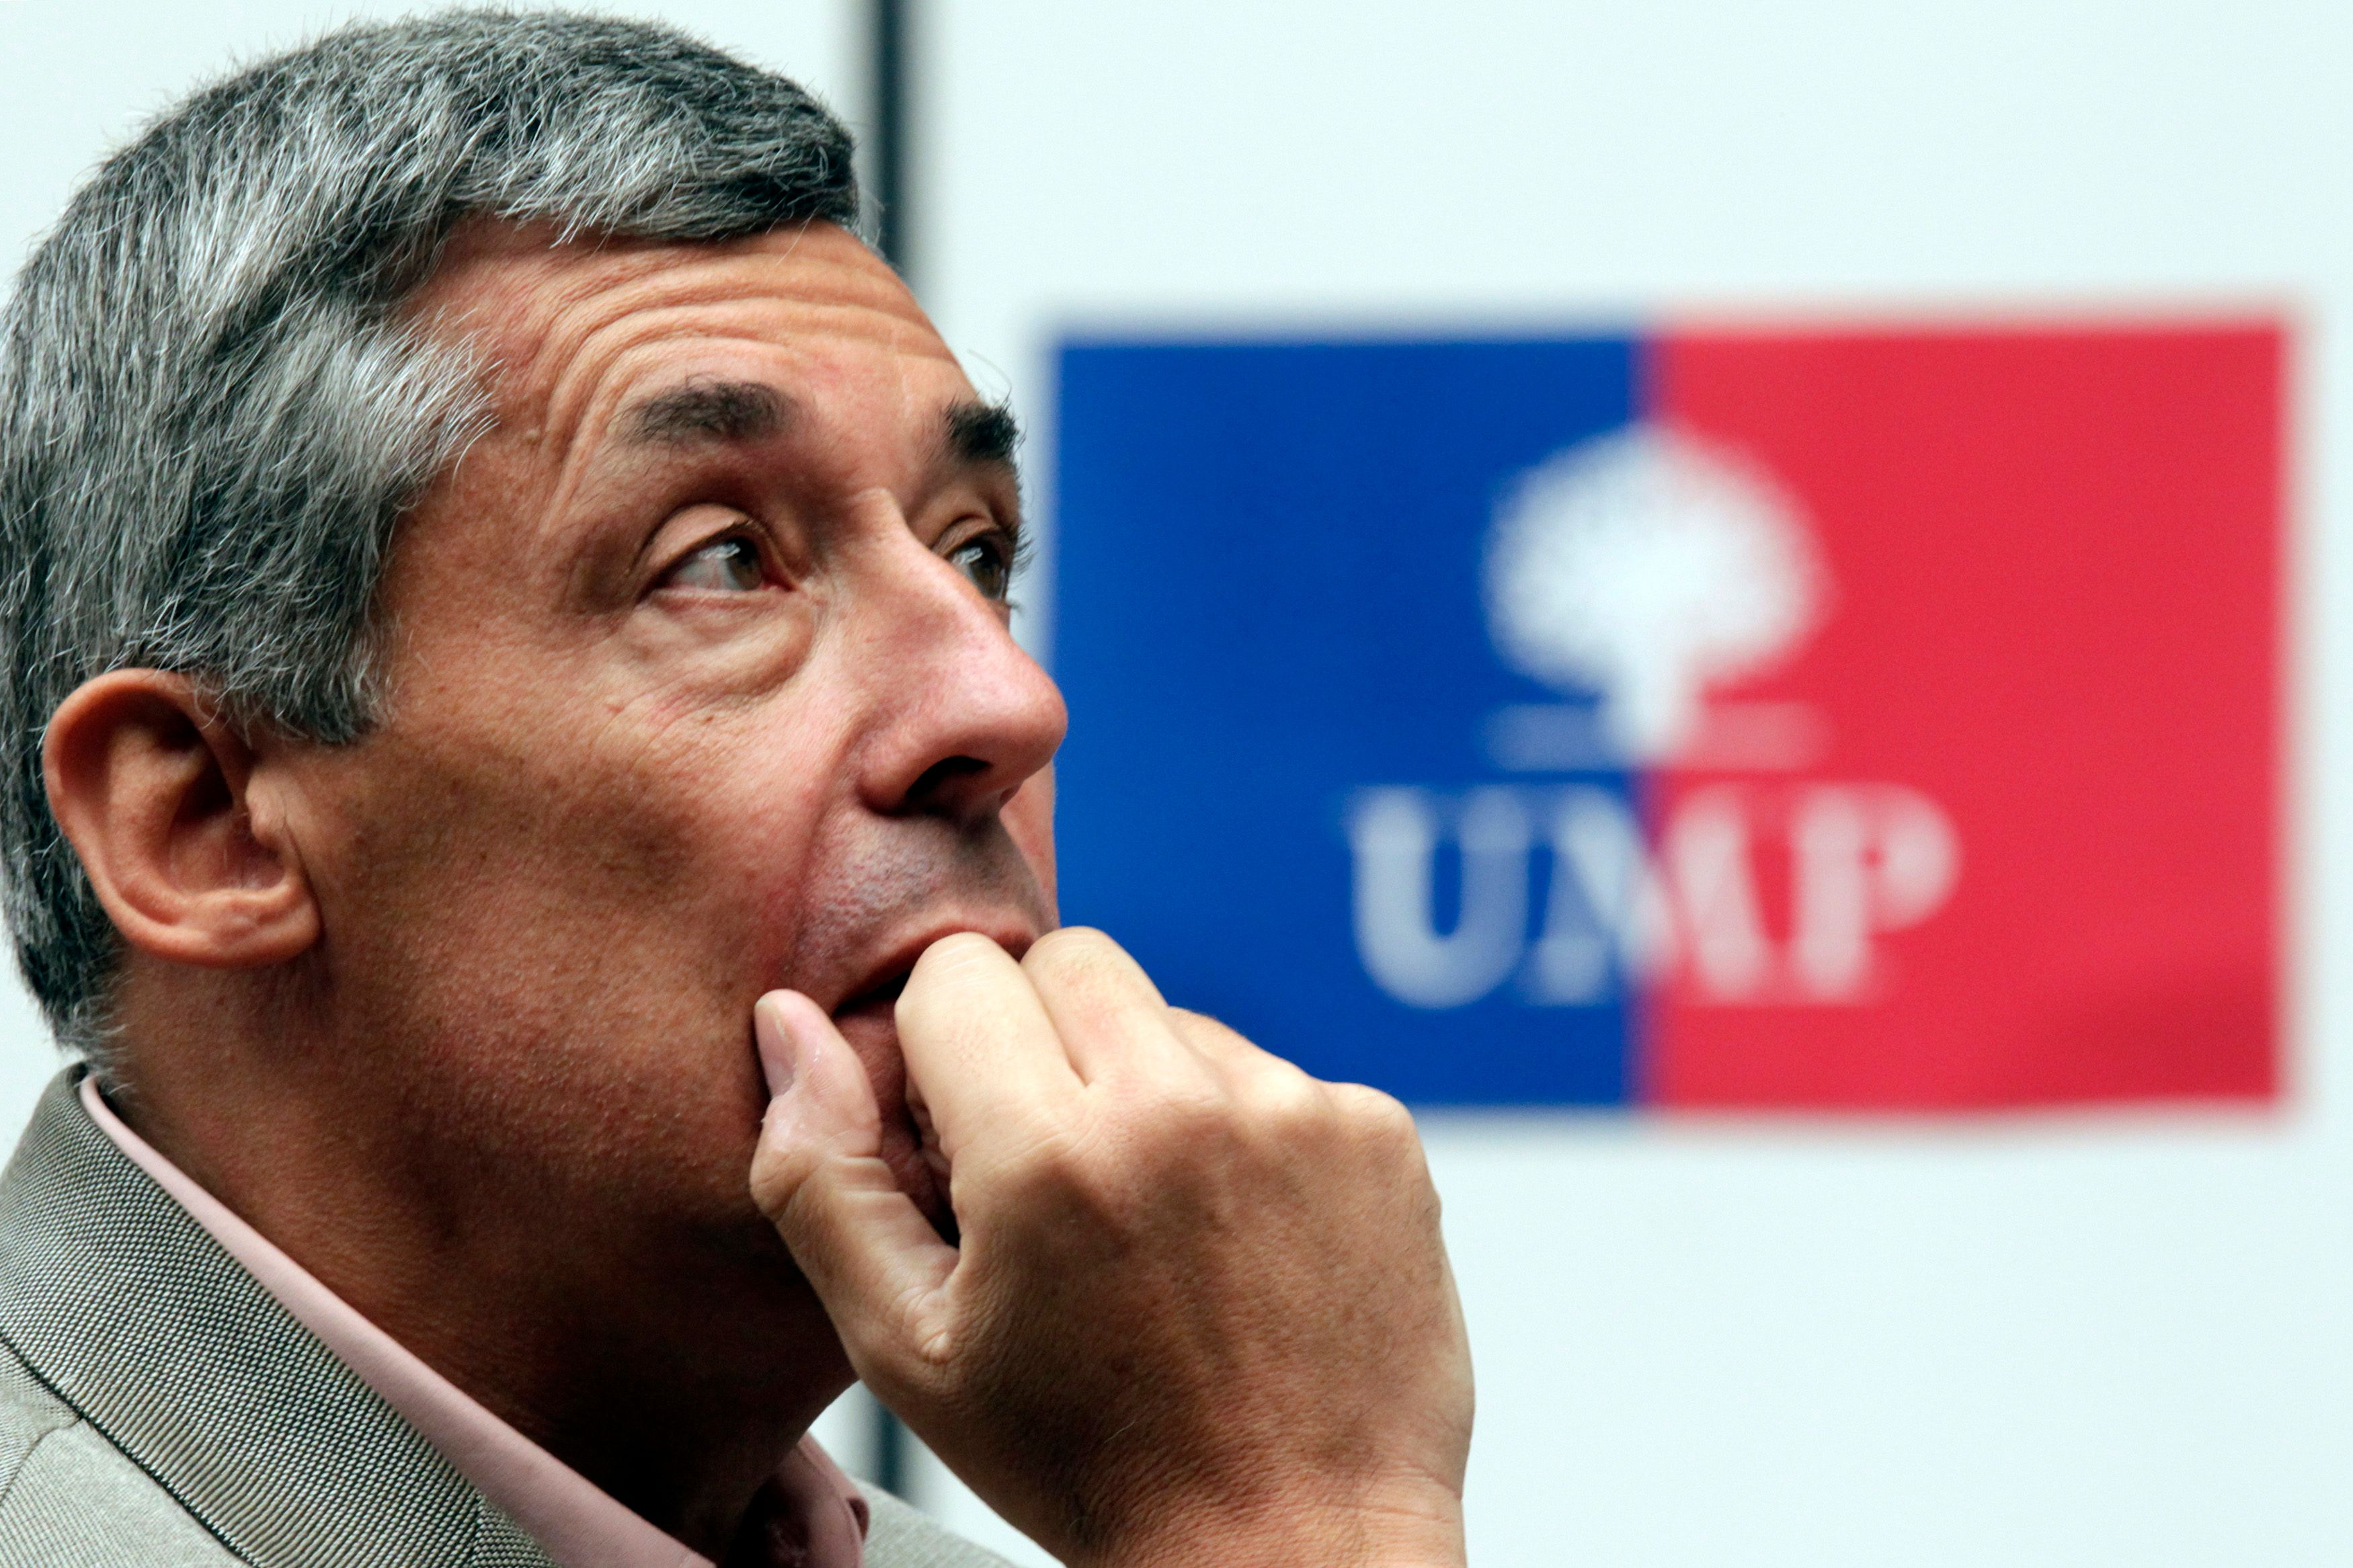 Henri Guaino veut garder sa force de conviction